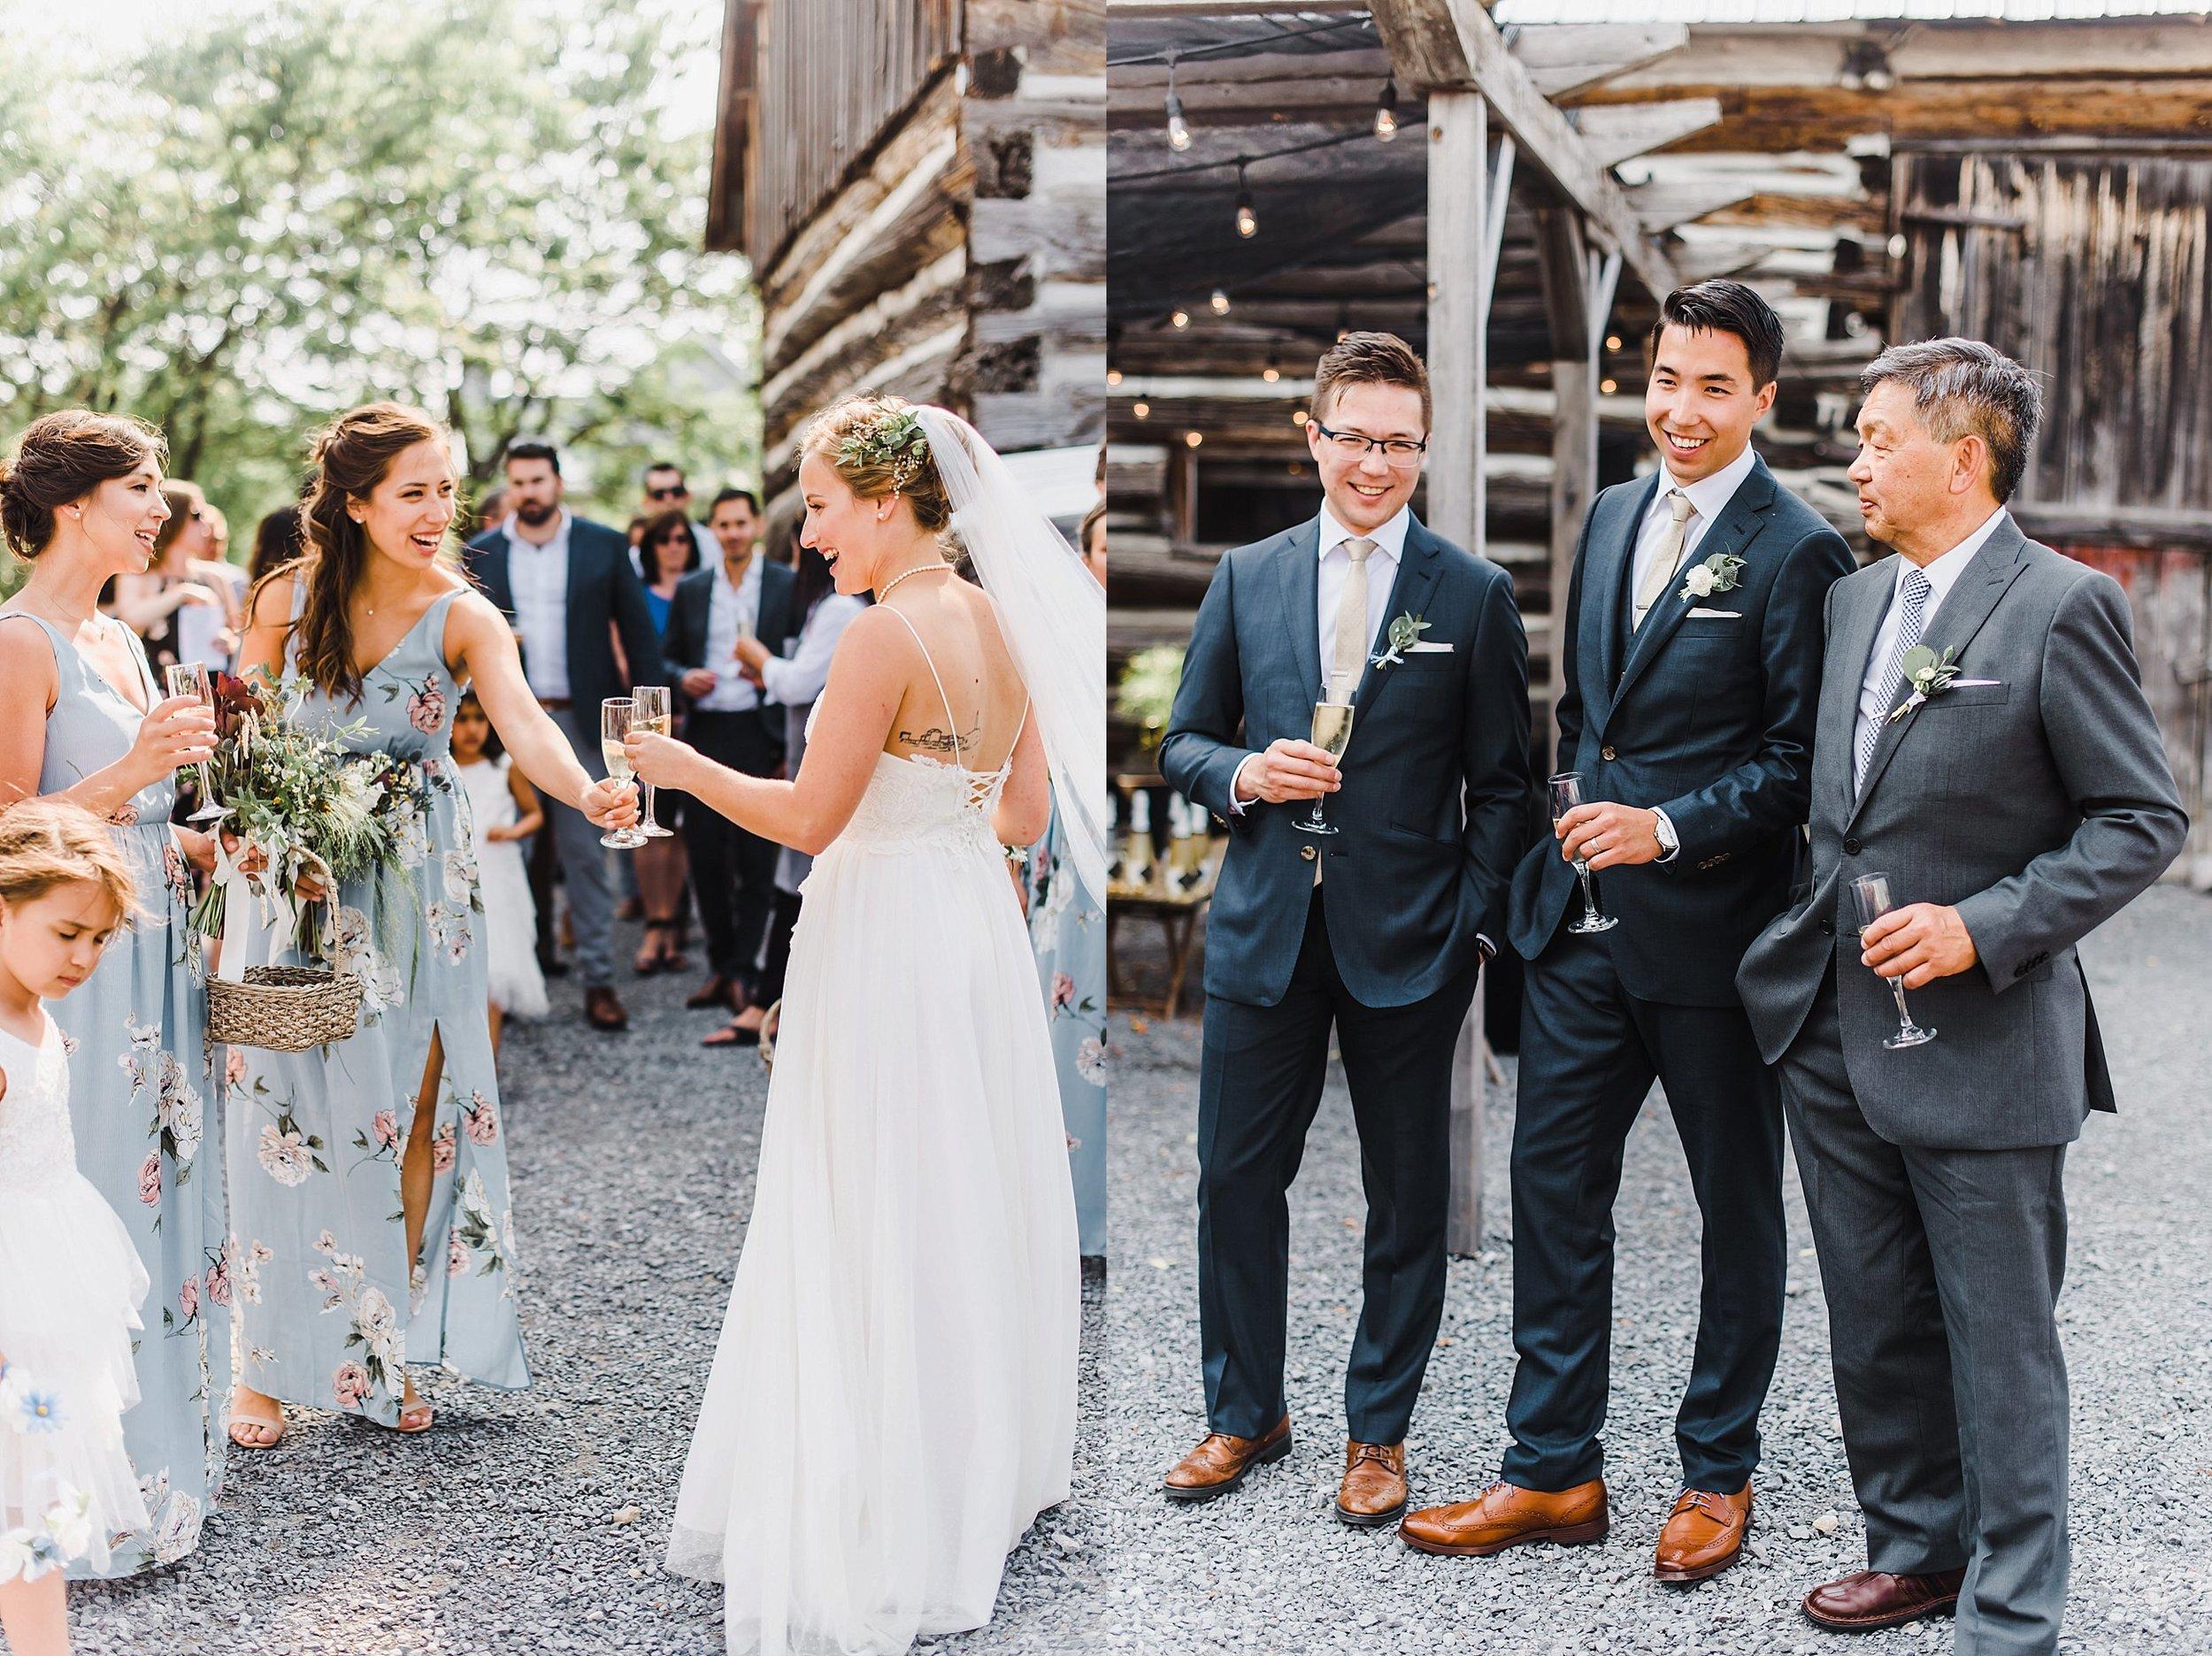 light airy indie fine art ottawa wedding photographer | Ali and Batoul Photography_0821.jpg